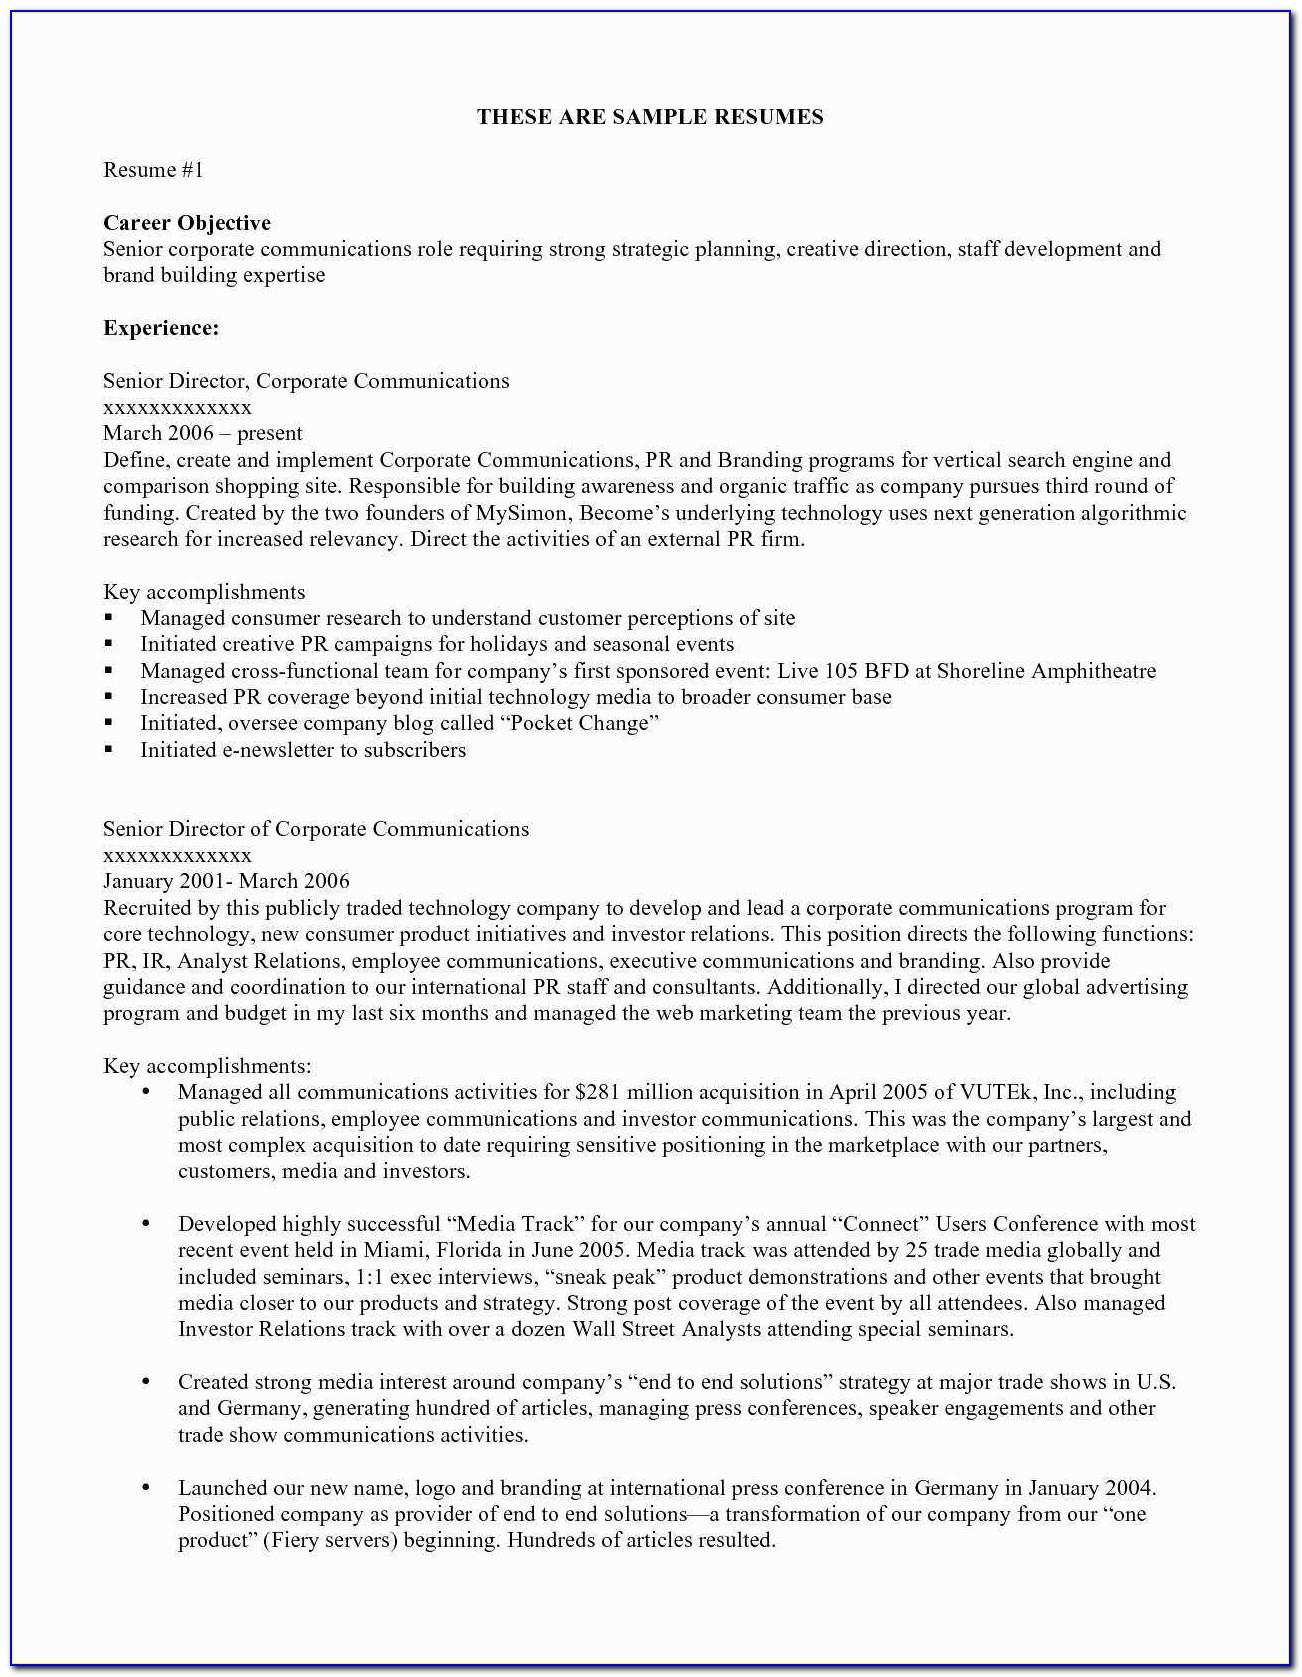 Combination Resume Sample For Career Change Bined Resume Template Mechanic Resume Template Free Mechanic